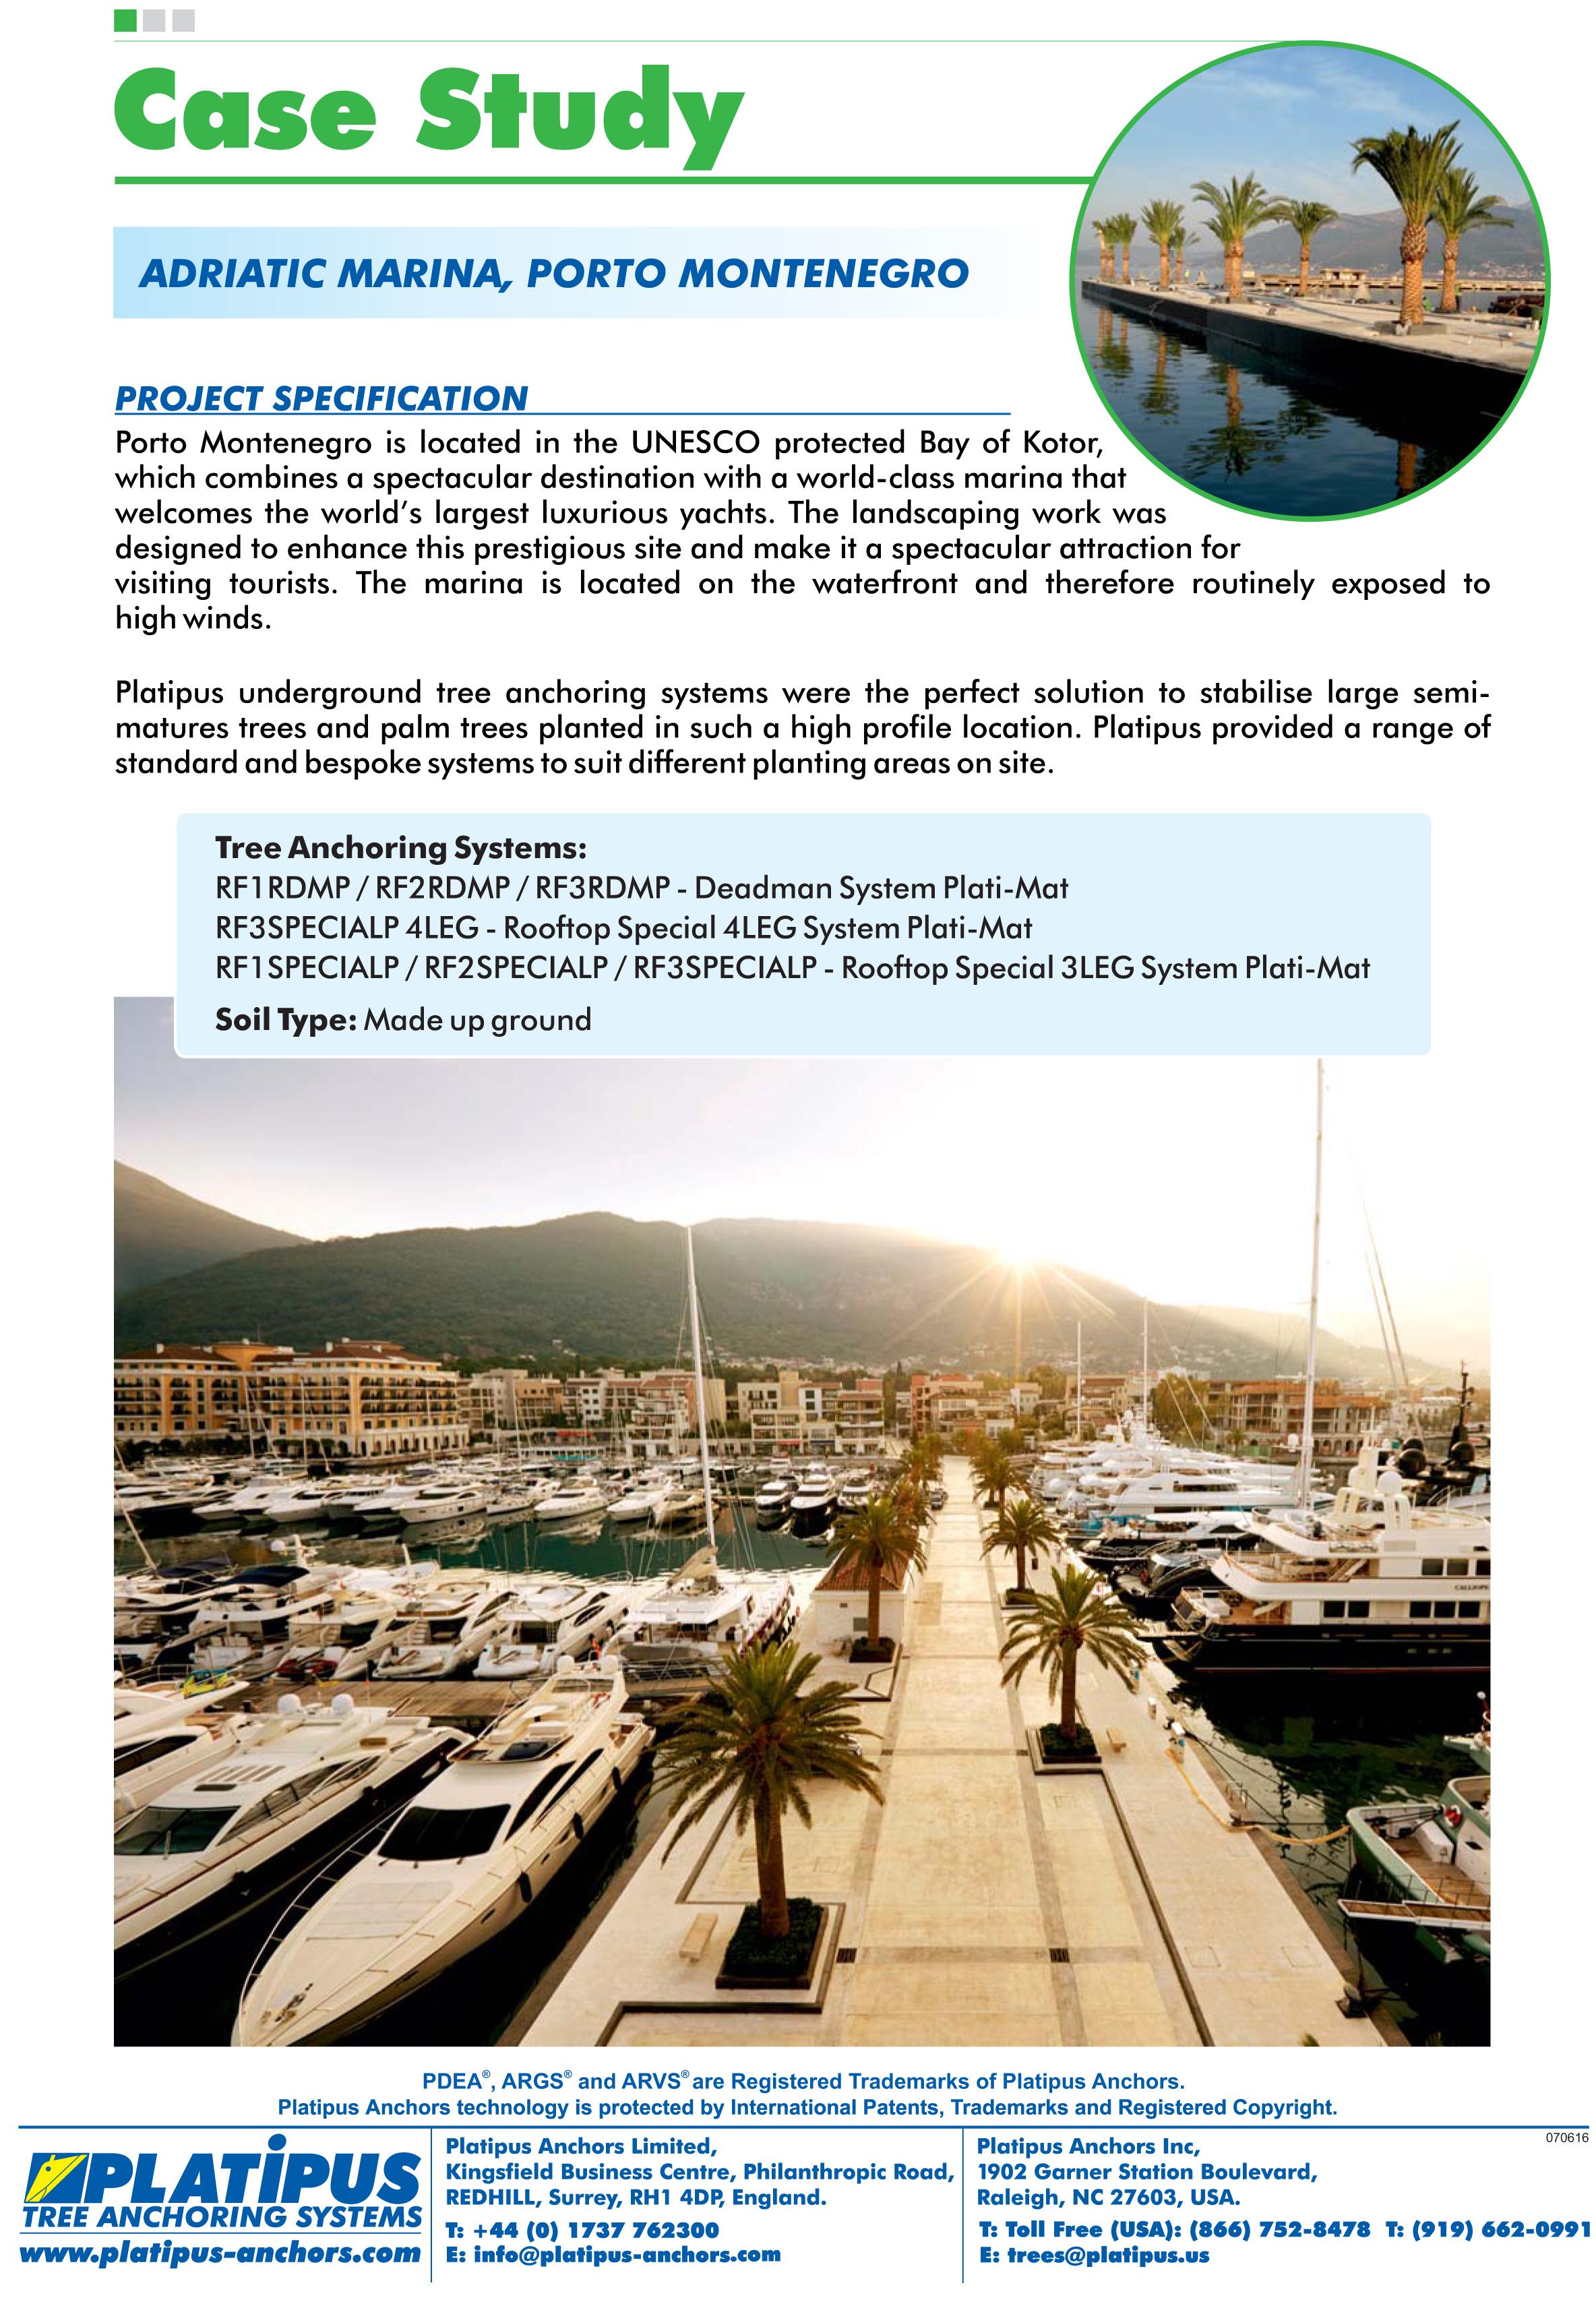 Case Study - Adriatic Marina, Porto Montenegro Brochure